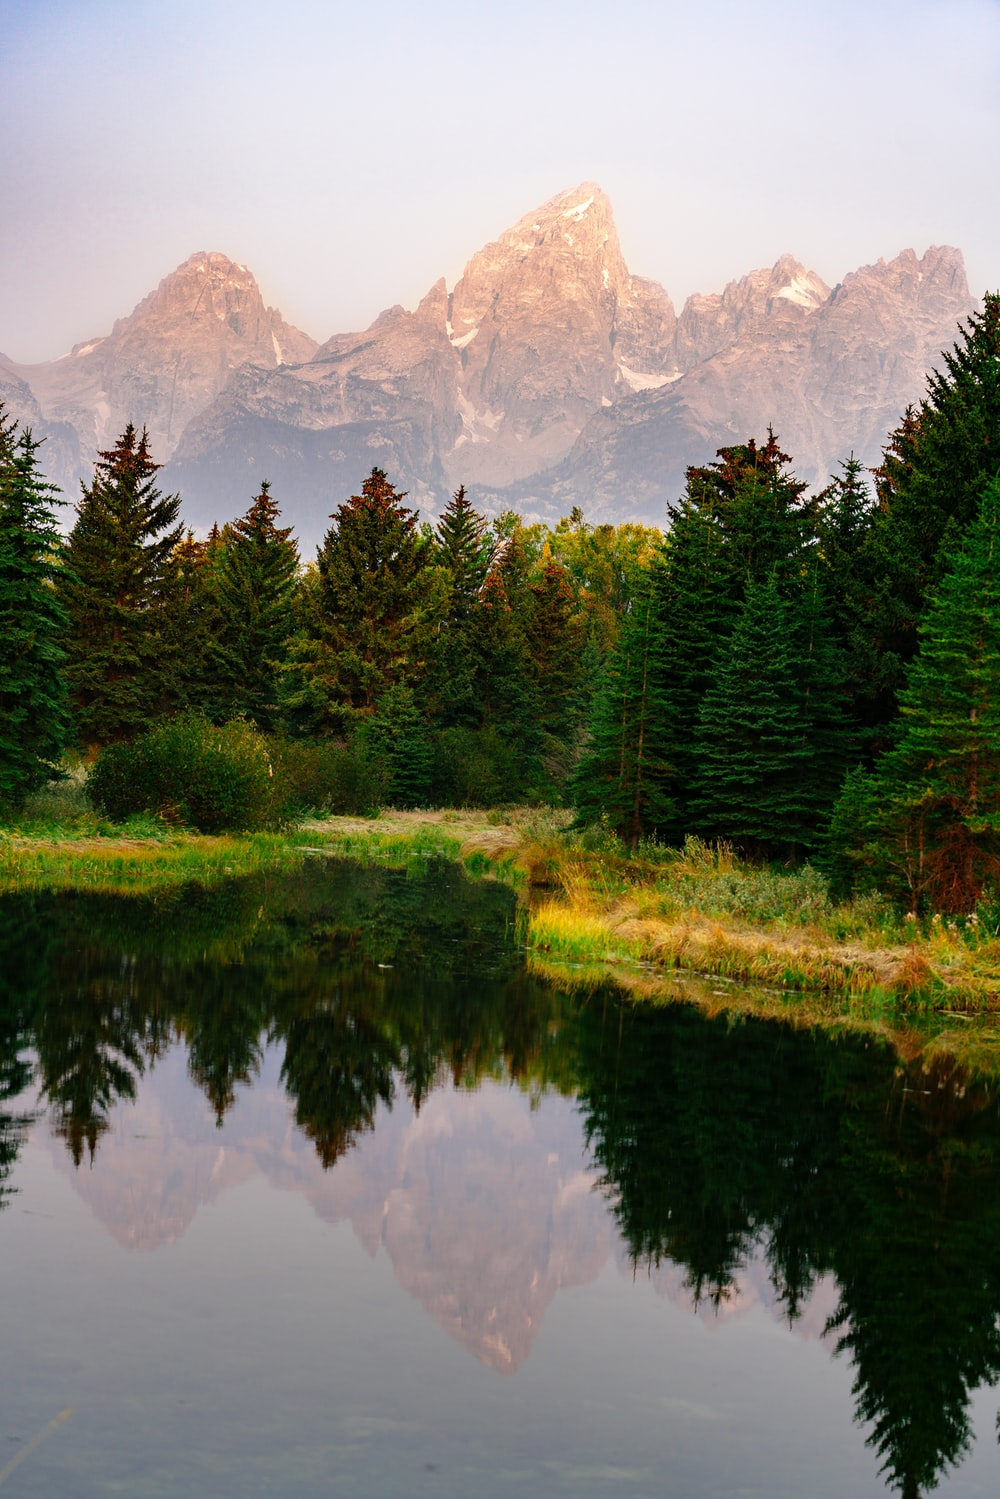 green pine trees near lake and mountain range